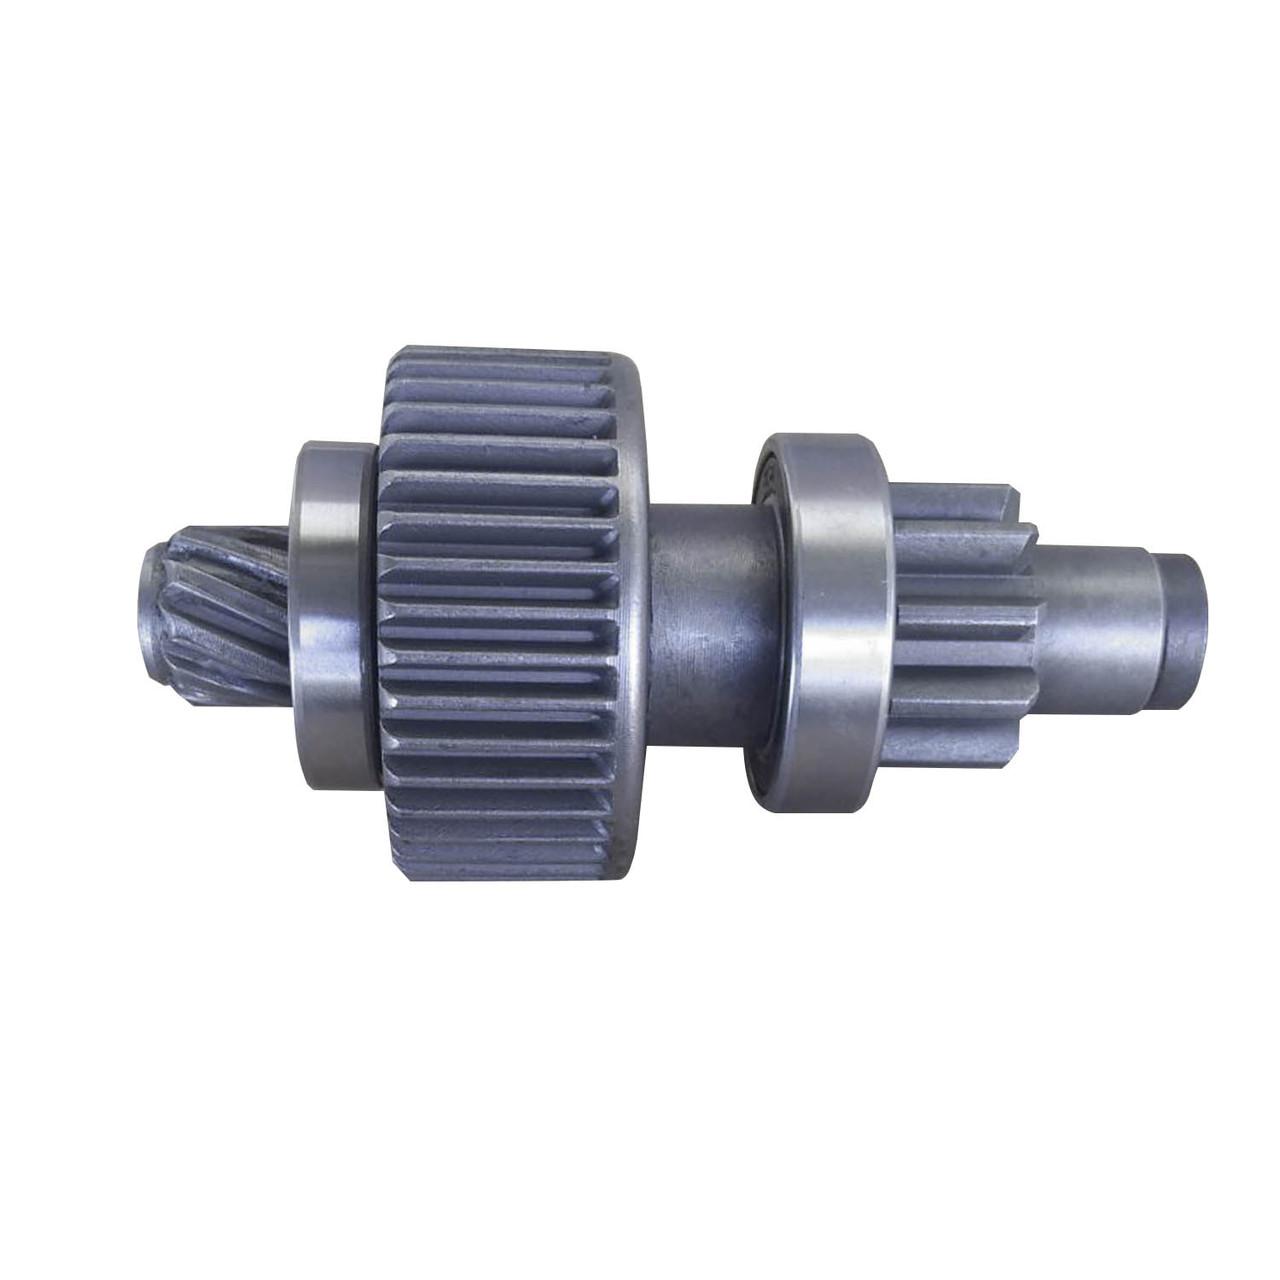 Привод стартера (бендикс) для стартера 2,8 кВт (z=10) 07-1228101 TM JFD